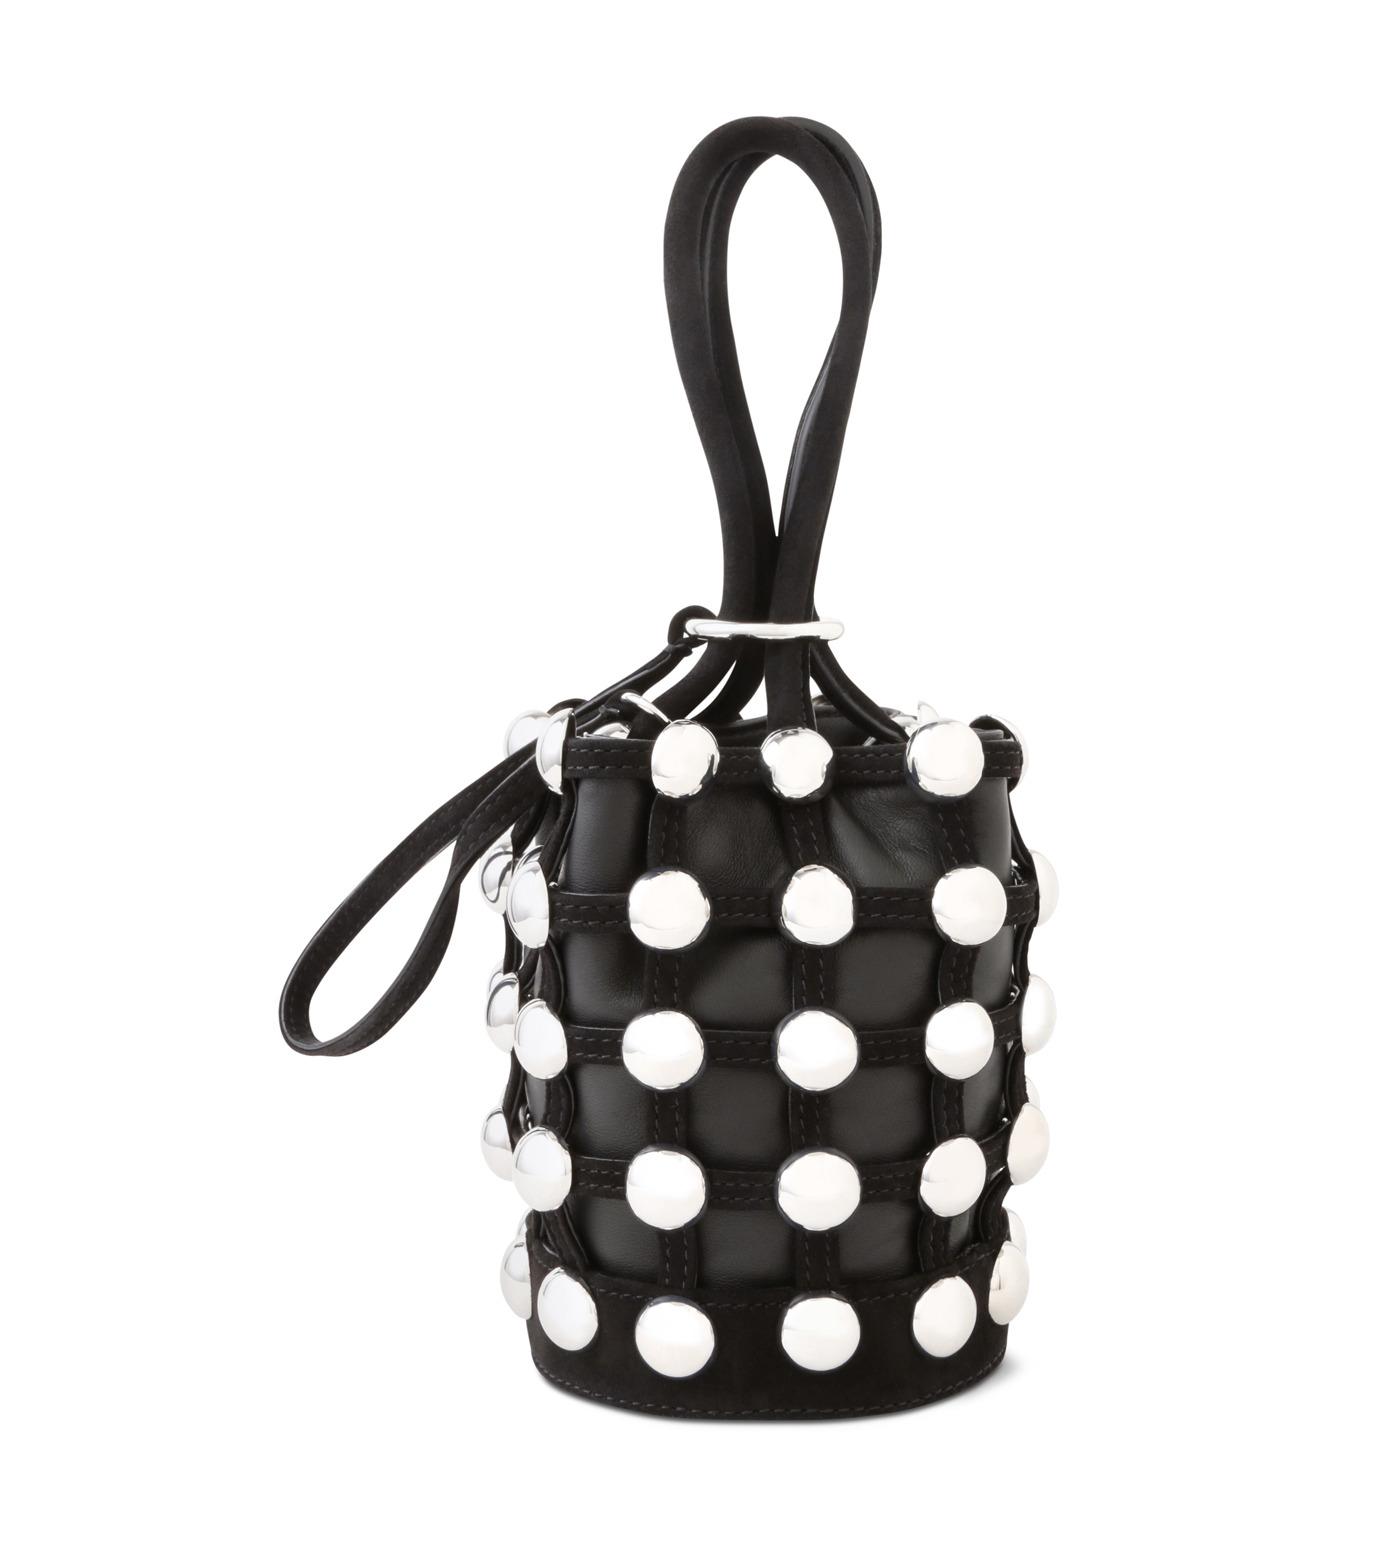 Alexander Wang(アレキサンダーワン)のRoxi Mini Bucket w/Studs-BLACK(ハンドバッグ/hand bag)-20C0038-13 拡大詳細画像1